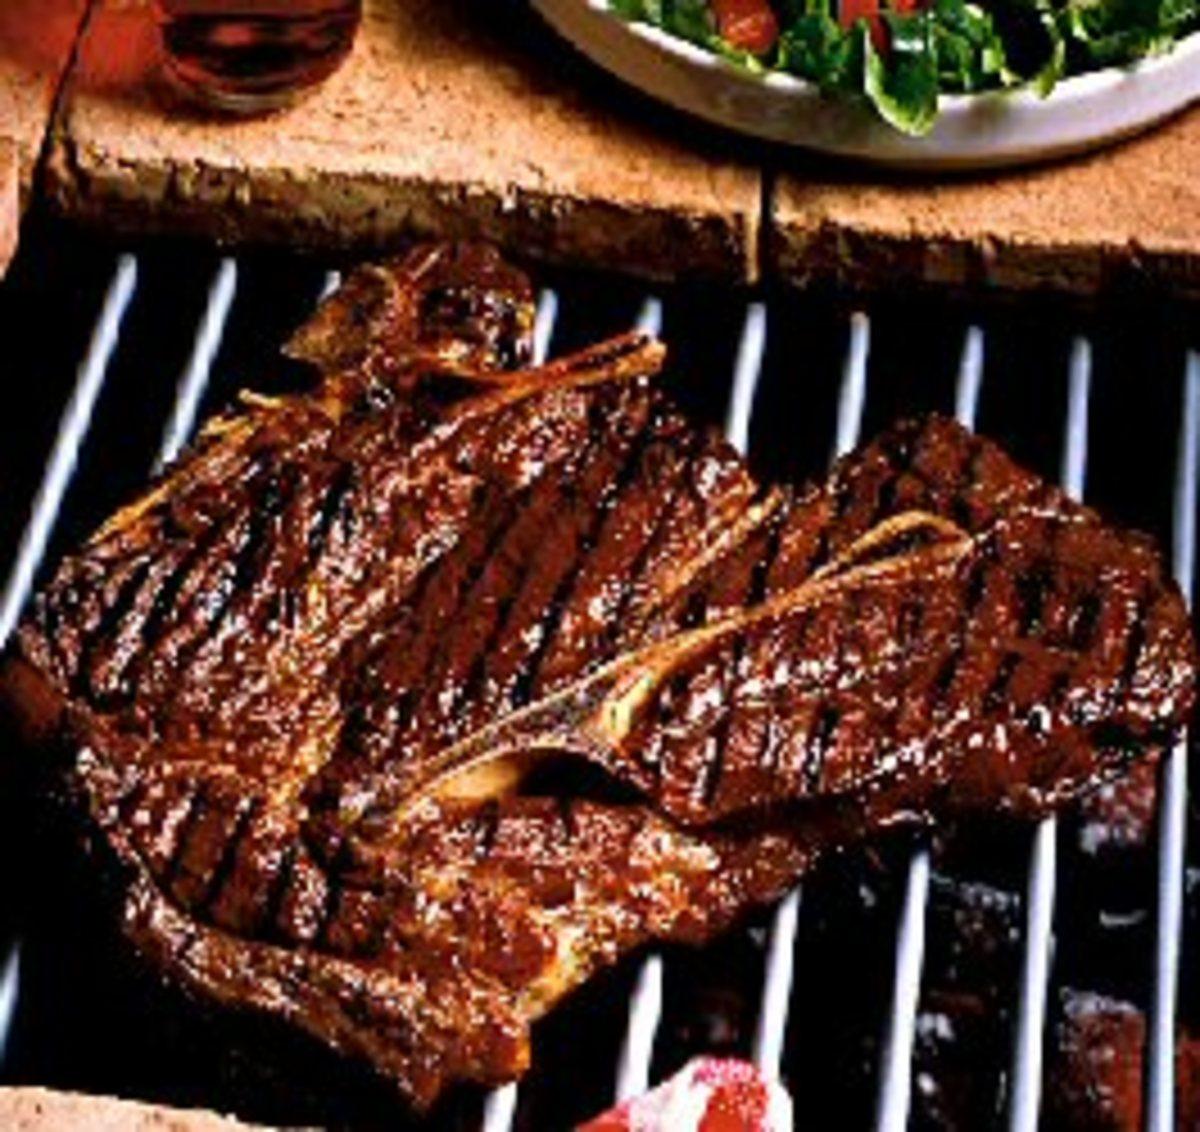 photo credit: steak-house-recipe.com